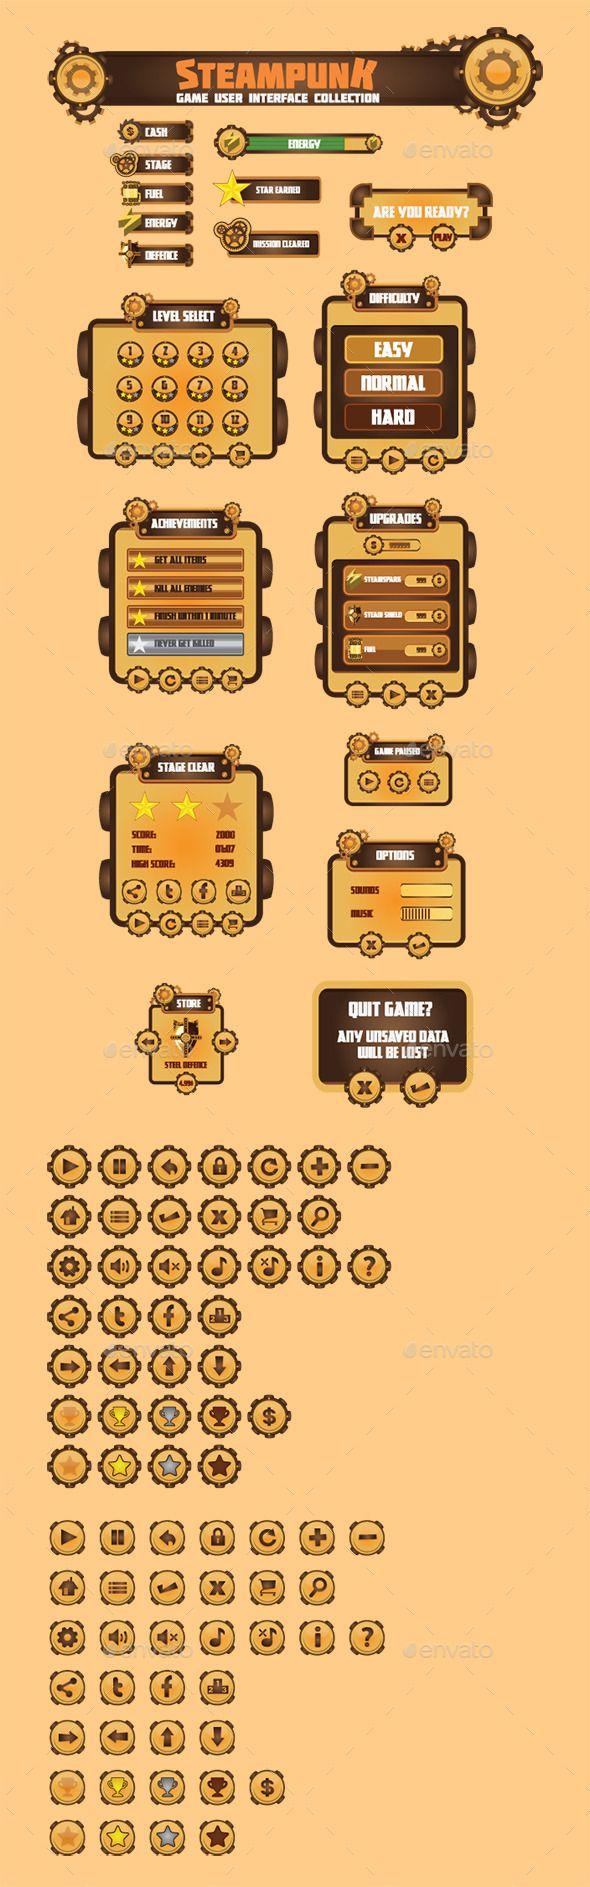 Steam Punk Game User Interface Set (Vector EPS, AI Illustrator, CS, 2d, alloy, black, bronze, brown, cog, copper, dark, game asset, game vectors, gear, gold, grey, gui, industry, iron, mechanical, mechanism, metal, power, punk, rust, silver, specific, steam, steaming, steampunk, theme, user interface, wheel)